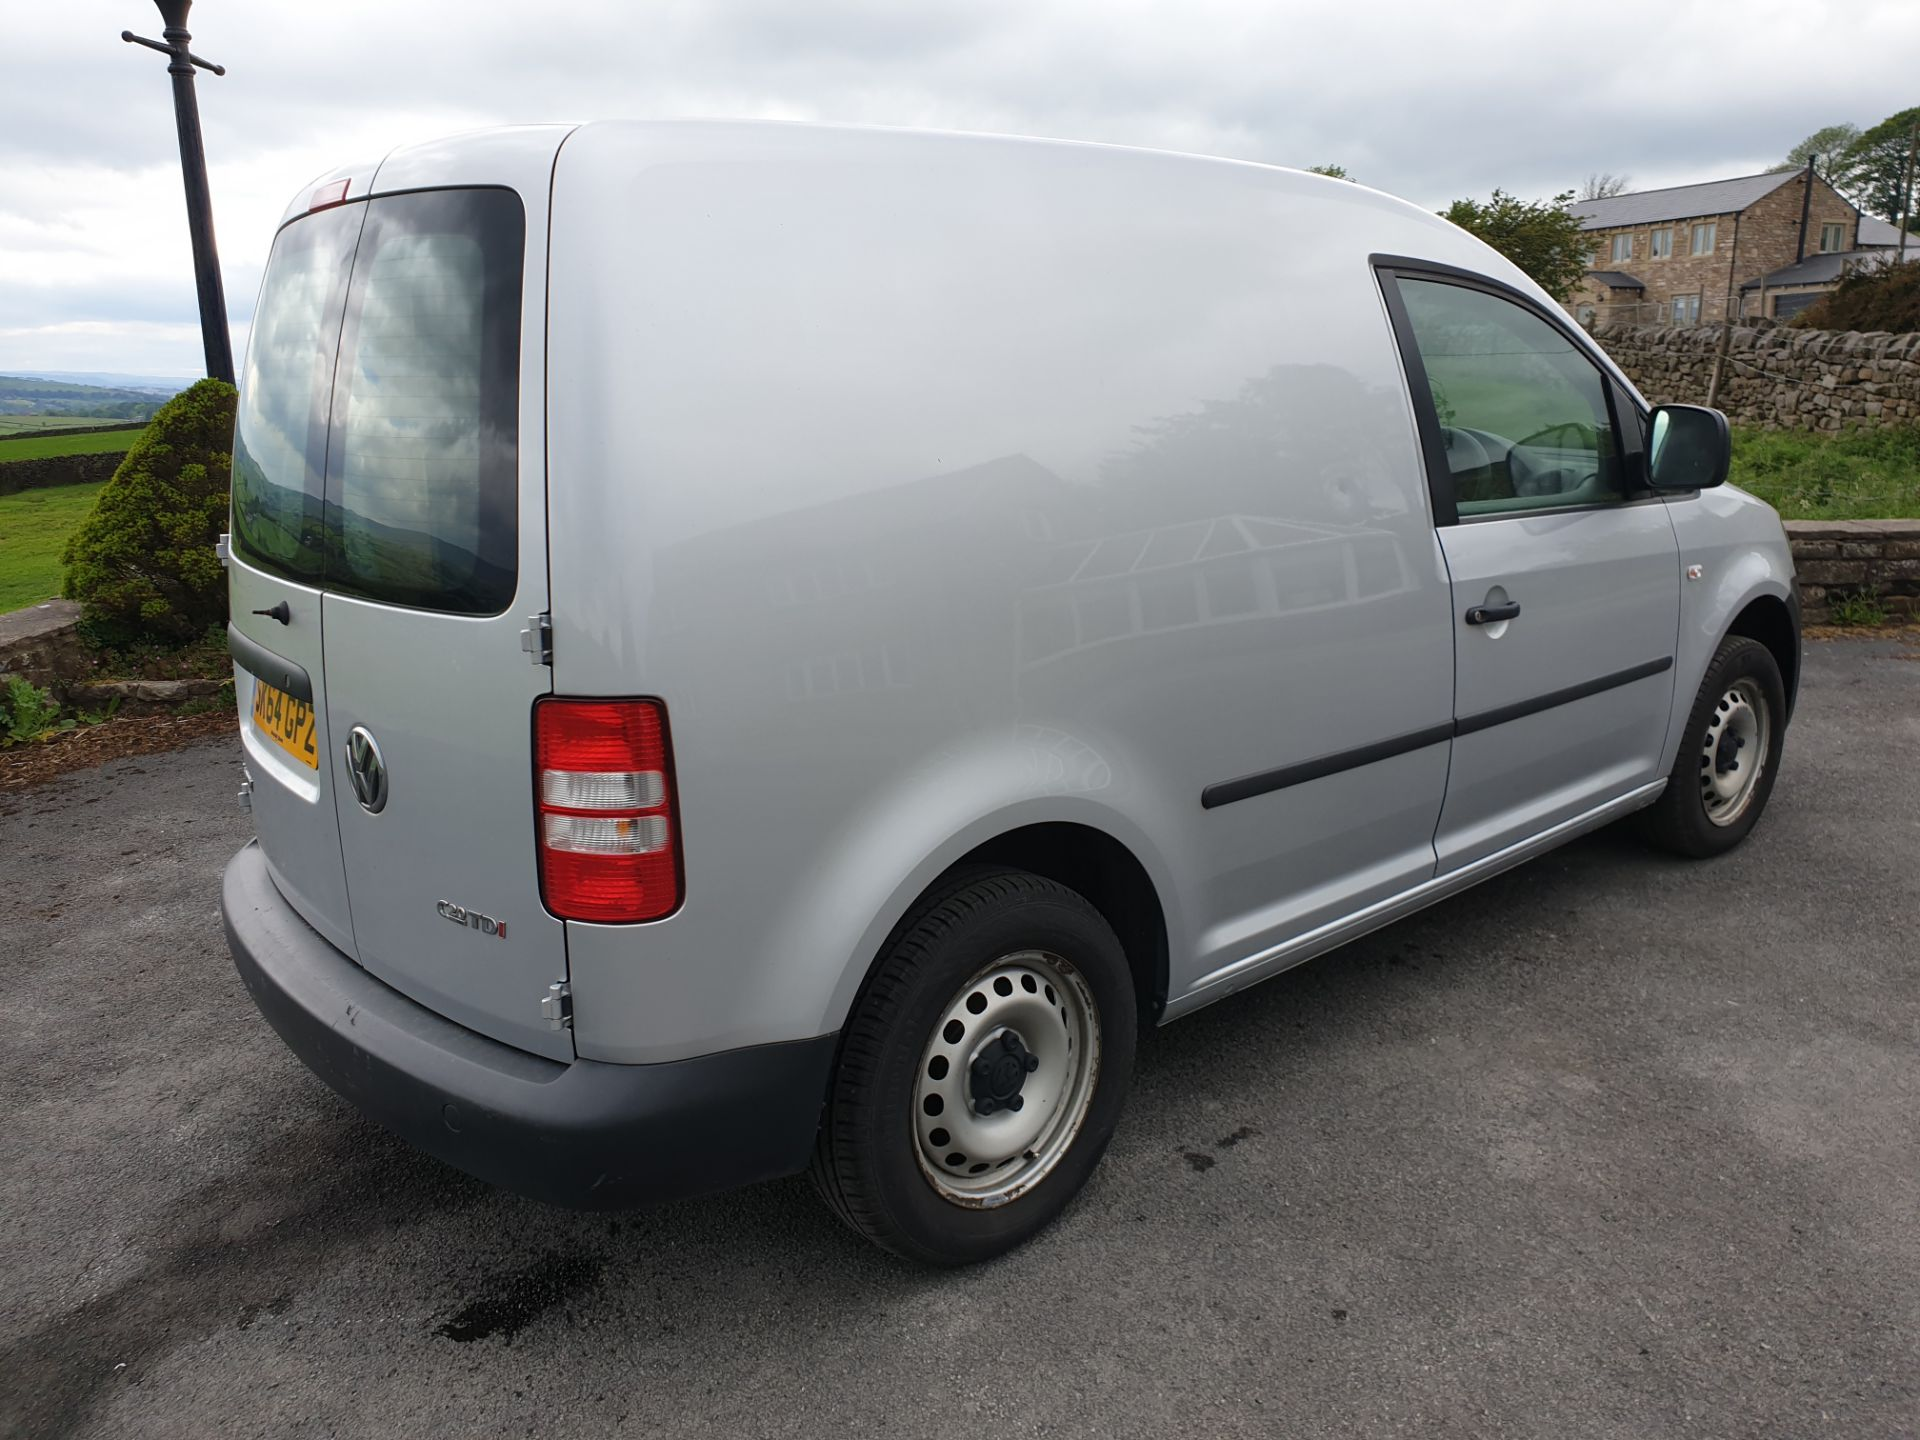 Lot 7 - 2014 / 64 VW Caddy